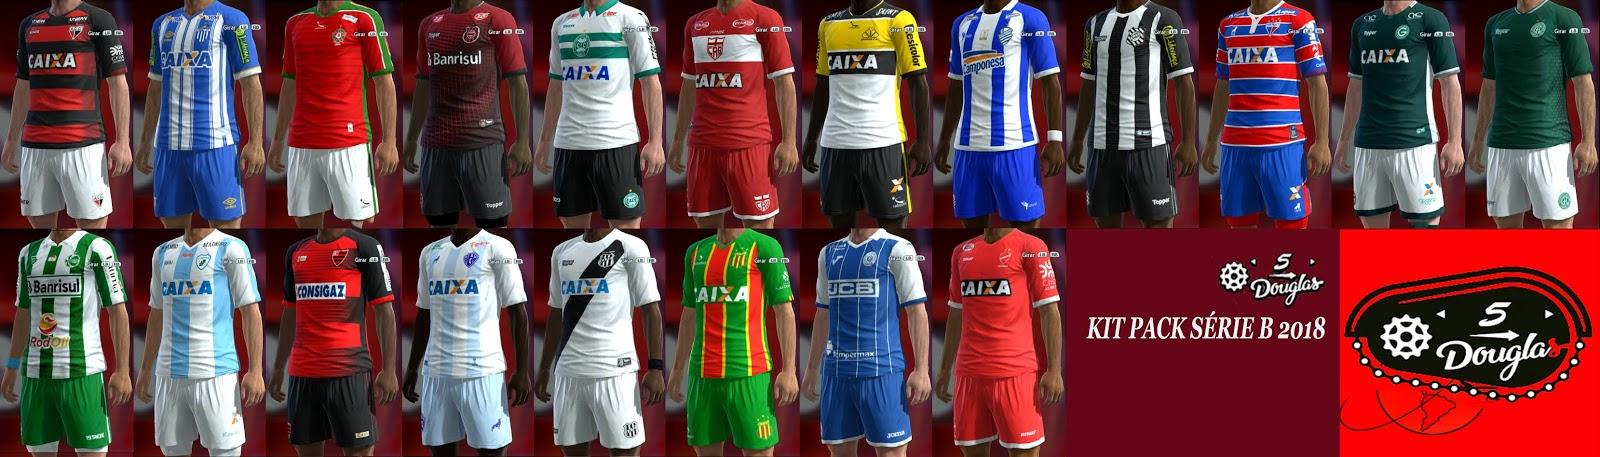 PES 2013 Brasileirão Série B Kit Pack FULL 2018